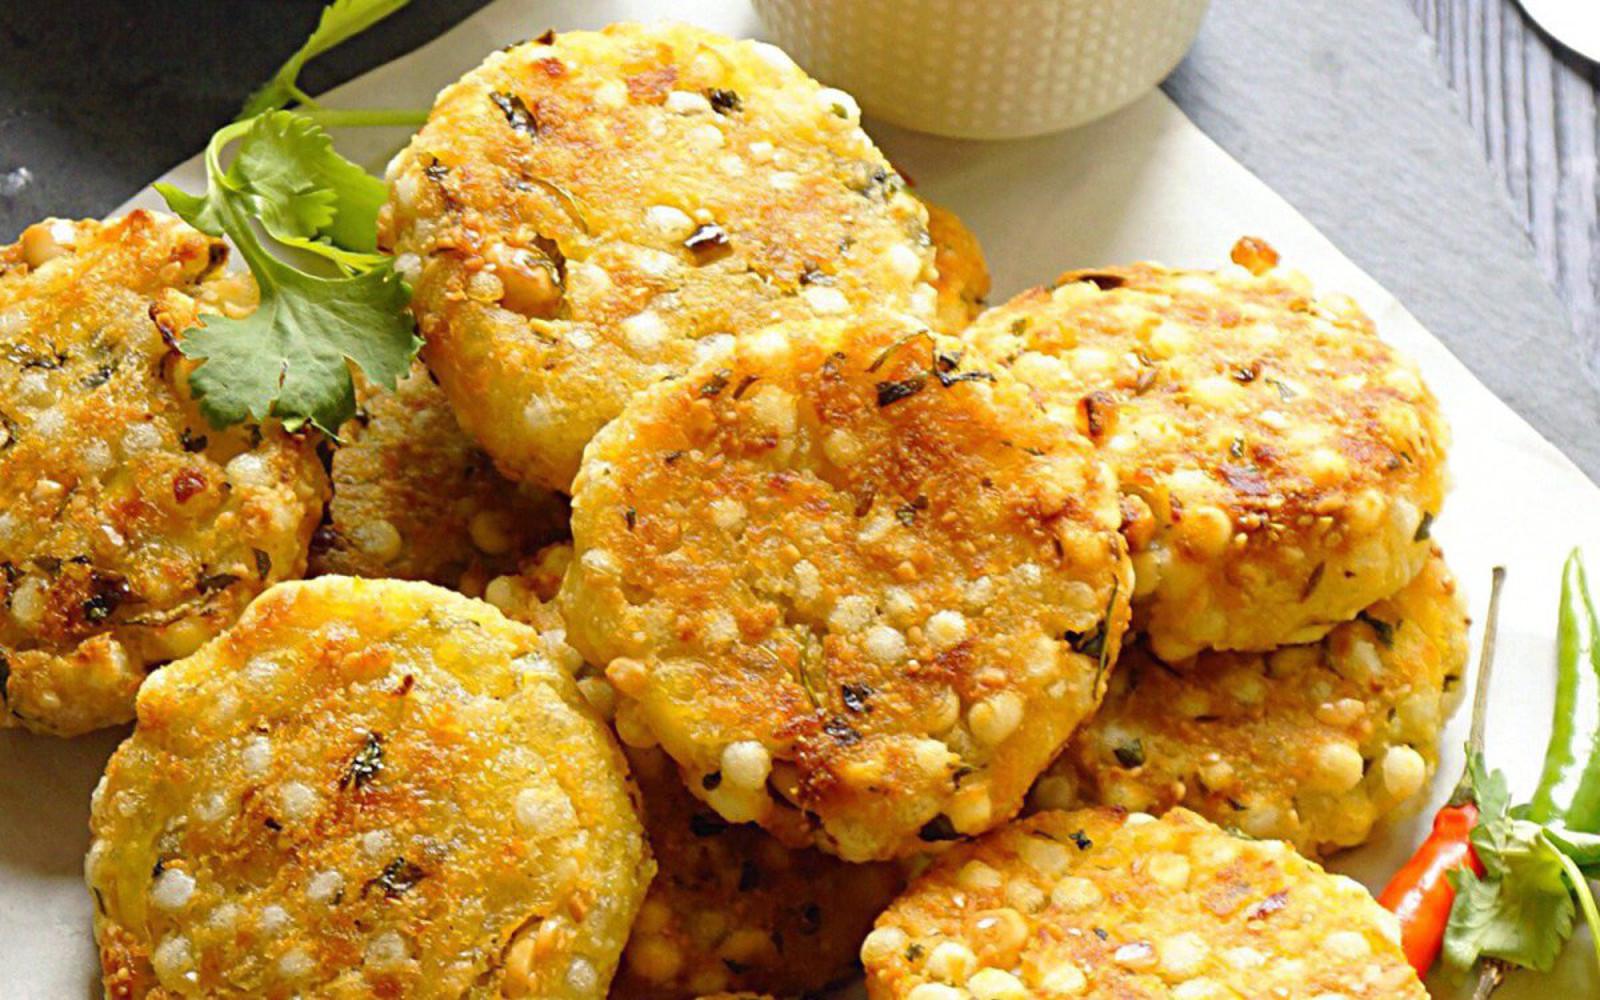 Baked Sabudana Vada: Indian Tapioca Fritters [Vegan, Grain-Free]